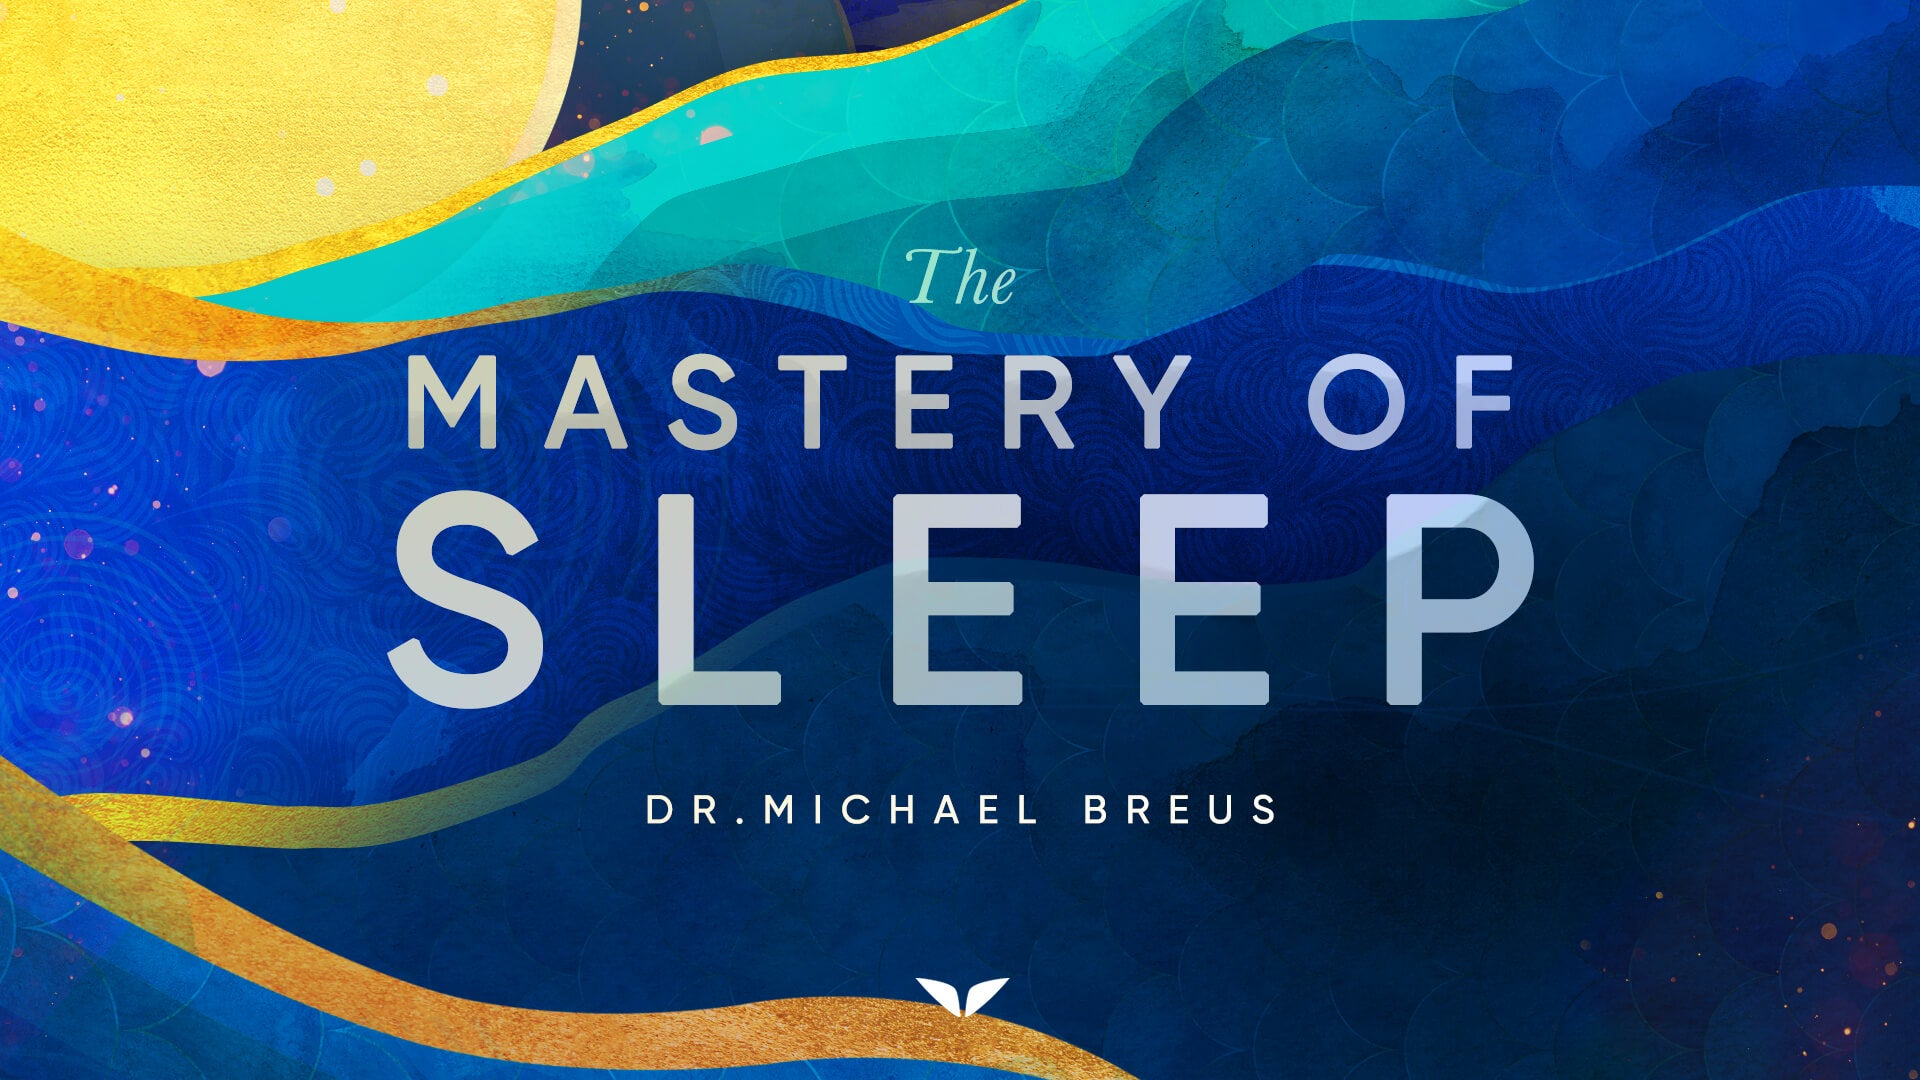 The Mastery of Sleep